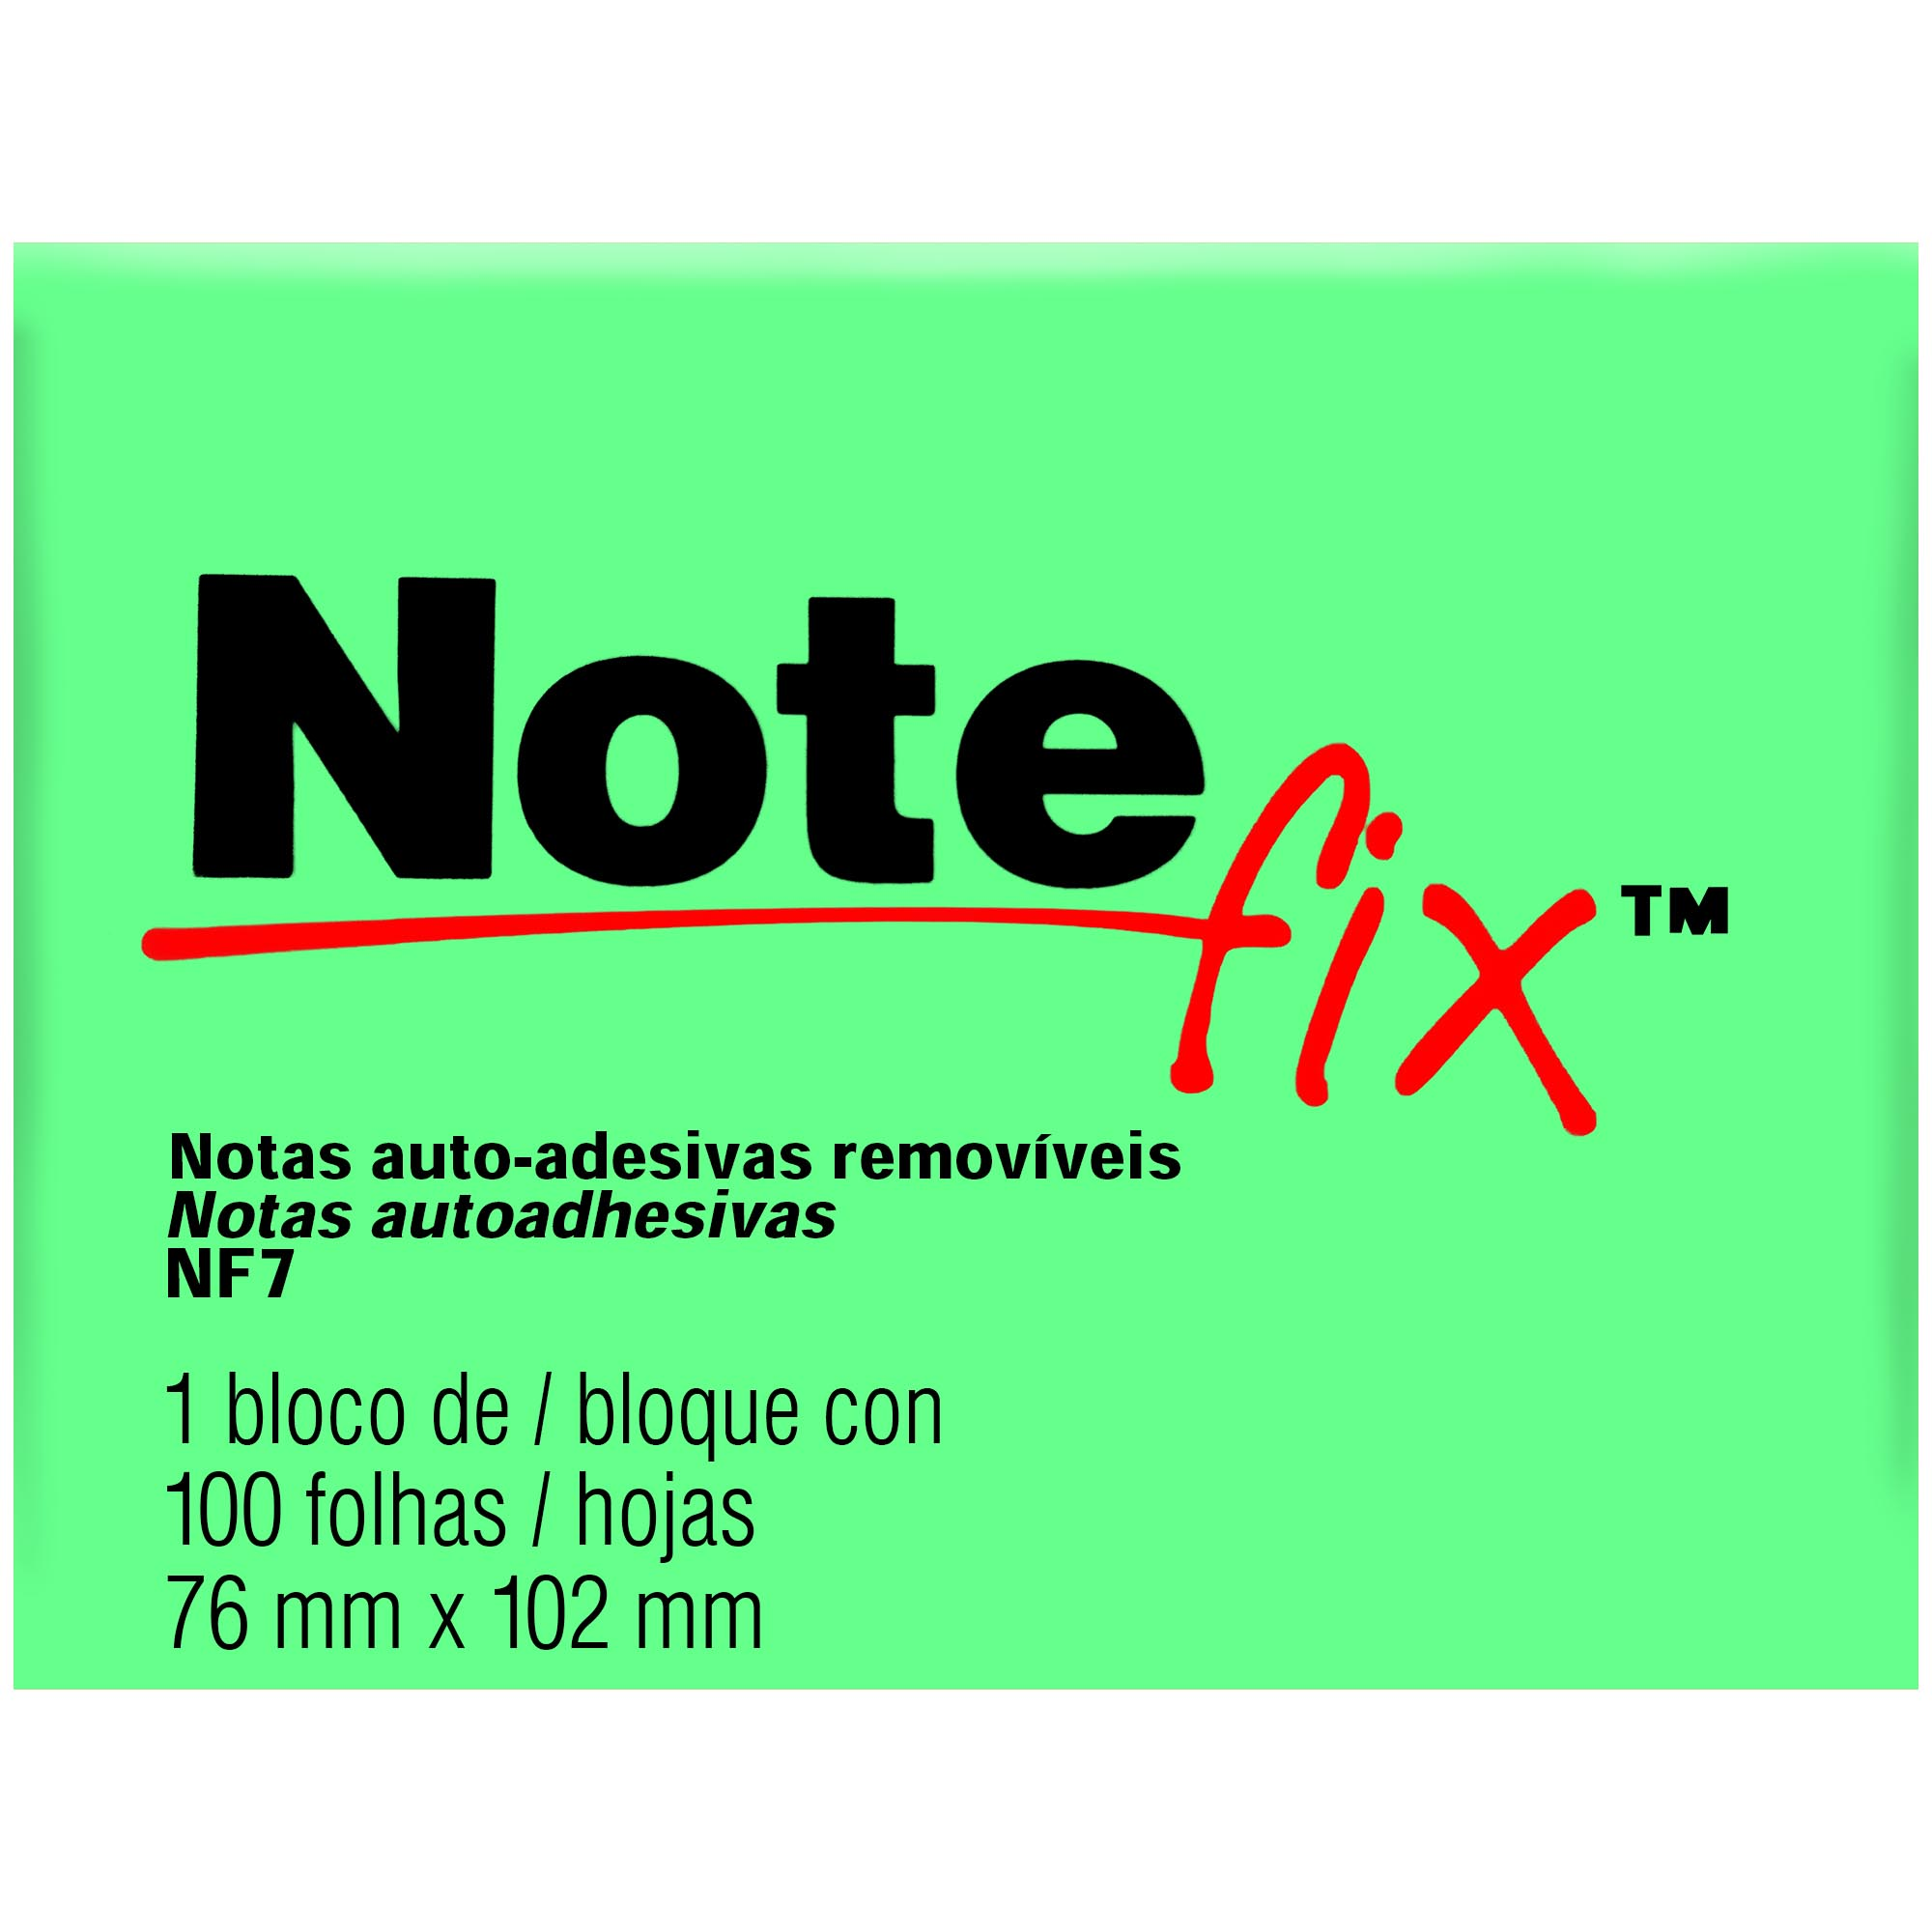 Bloco Autoadesivo Notefix NFX7 76MMX102MM 100FLS Cor Verde HB004116099 - 3M